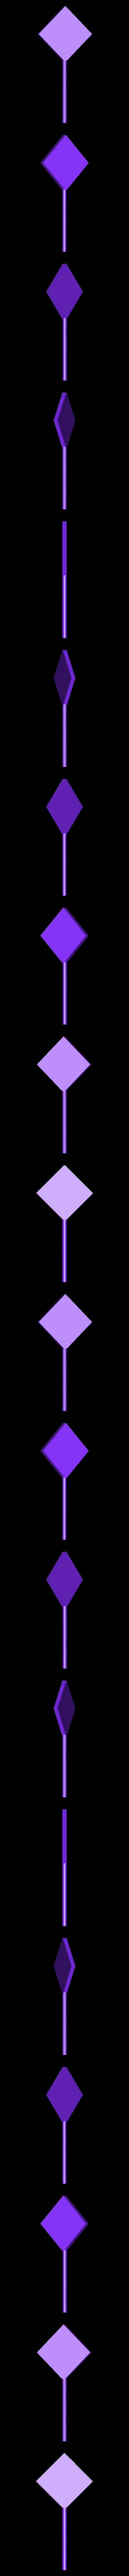 traffic-sign_romb.stl Download free STL file Traffic Sign Models • 3D print model, Saran